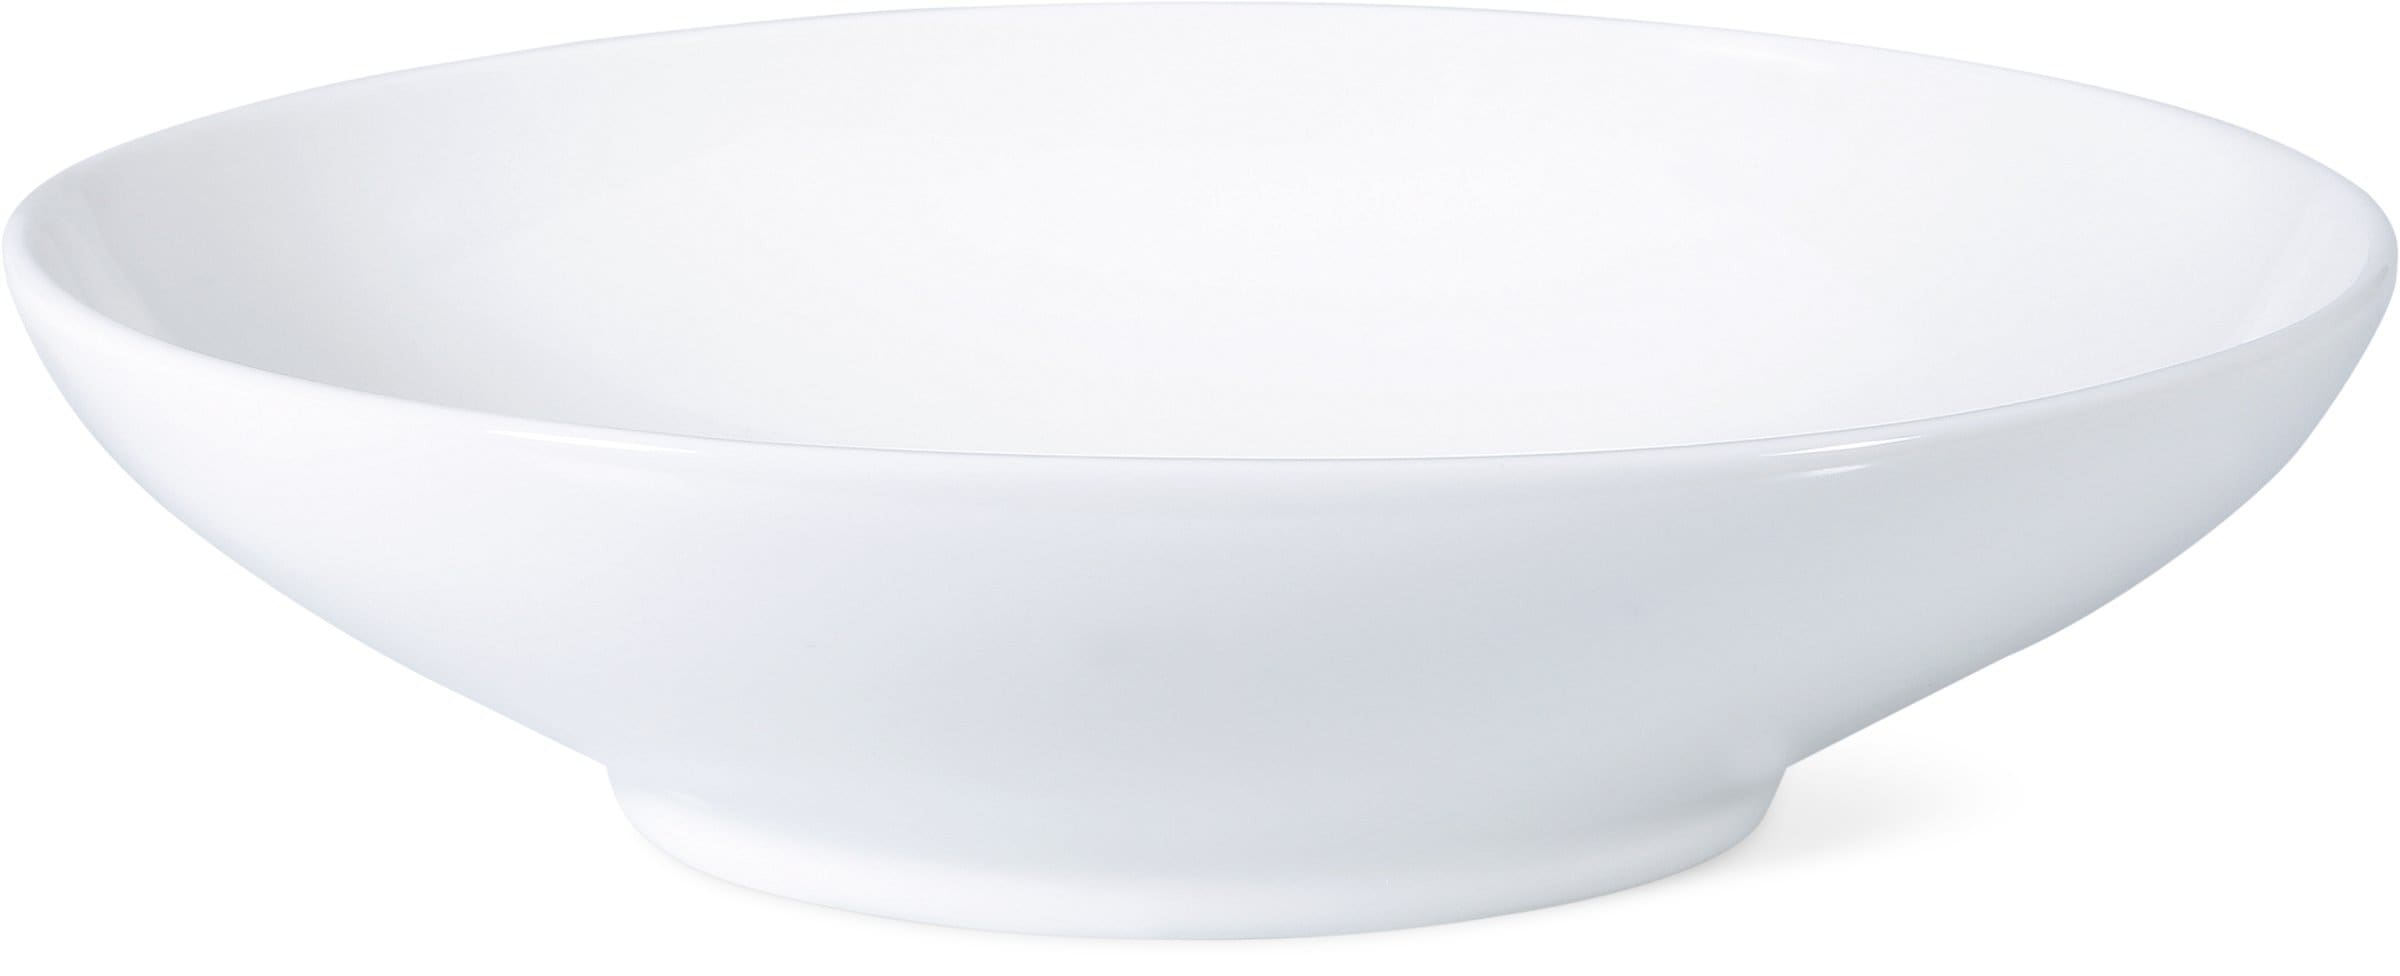 Cucina & Tavola PURE Schüssel 21x16.5cm